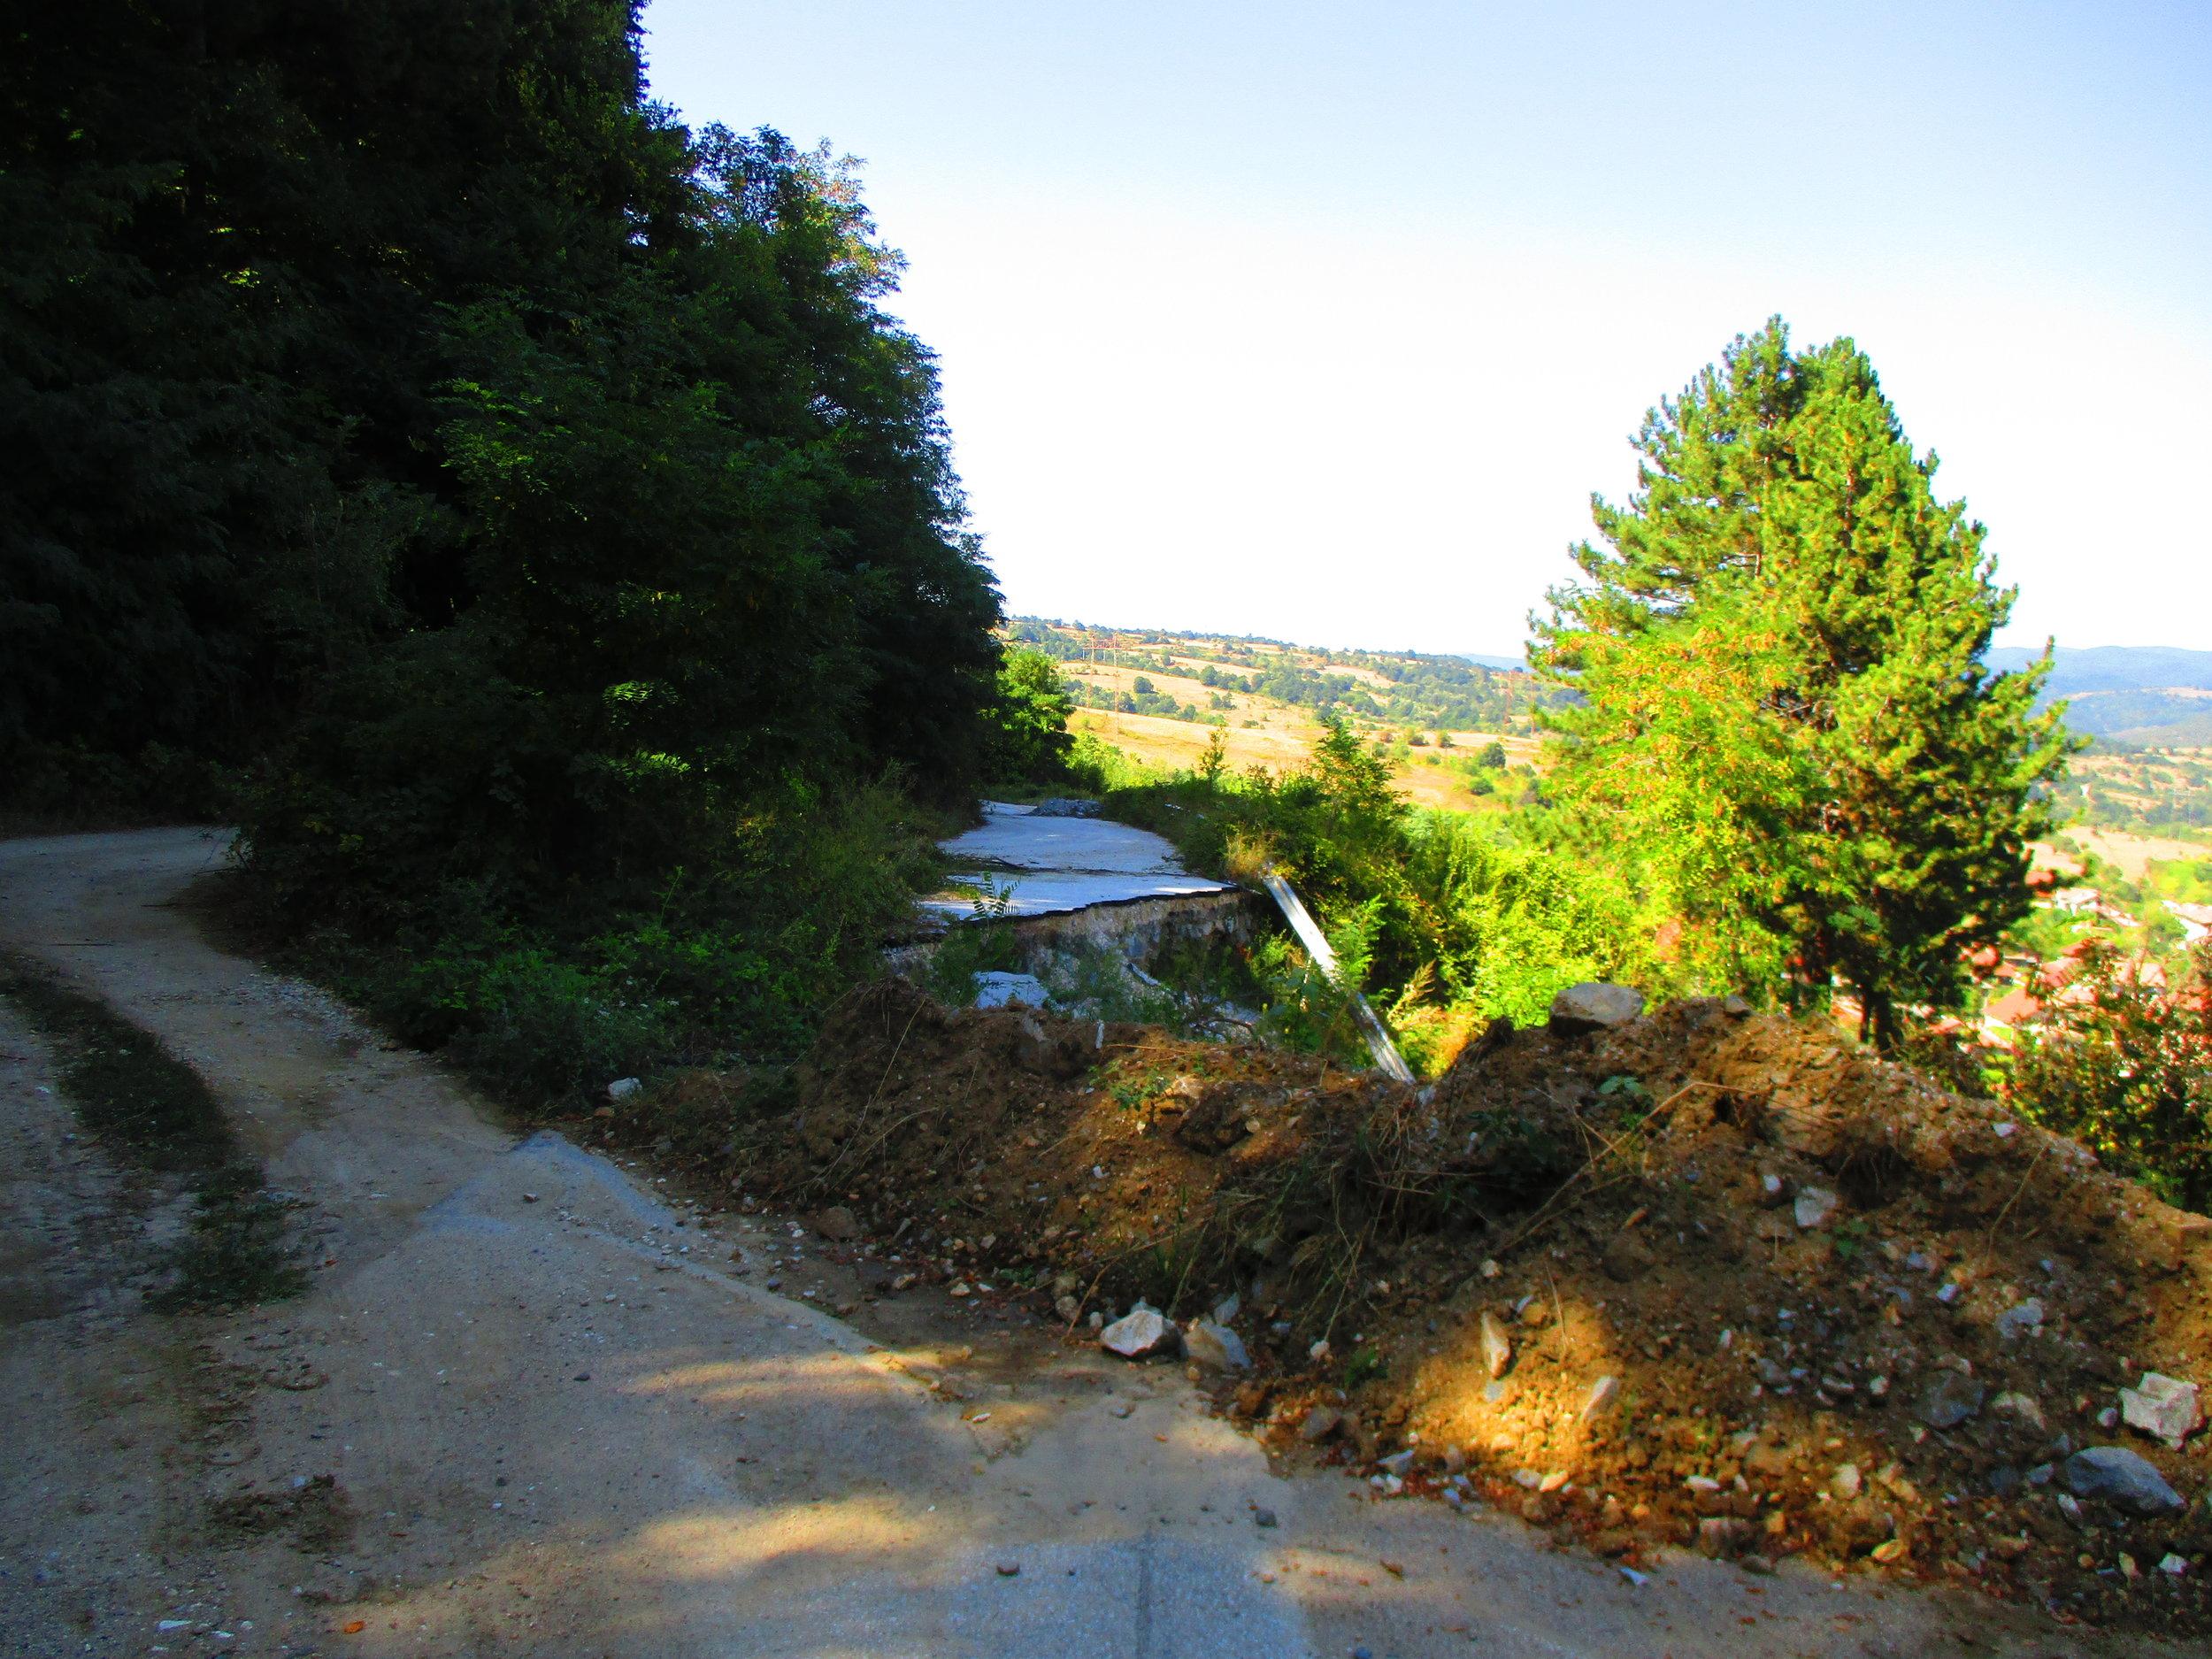 Diversion around a landslide